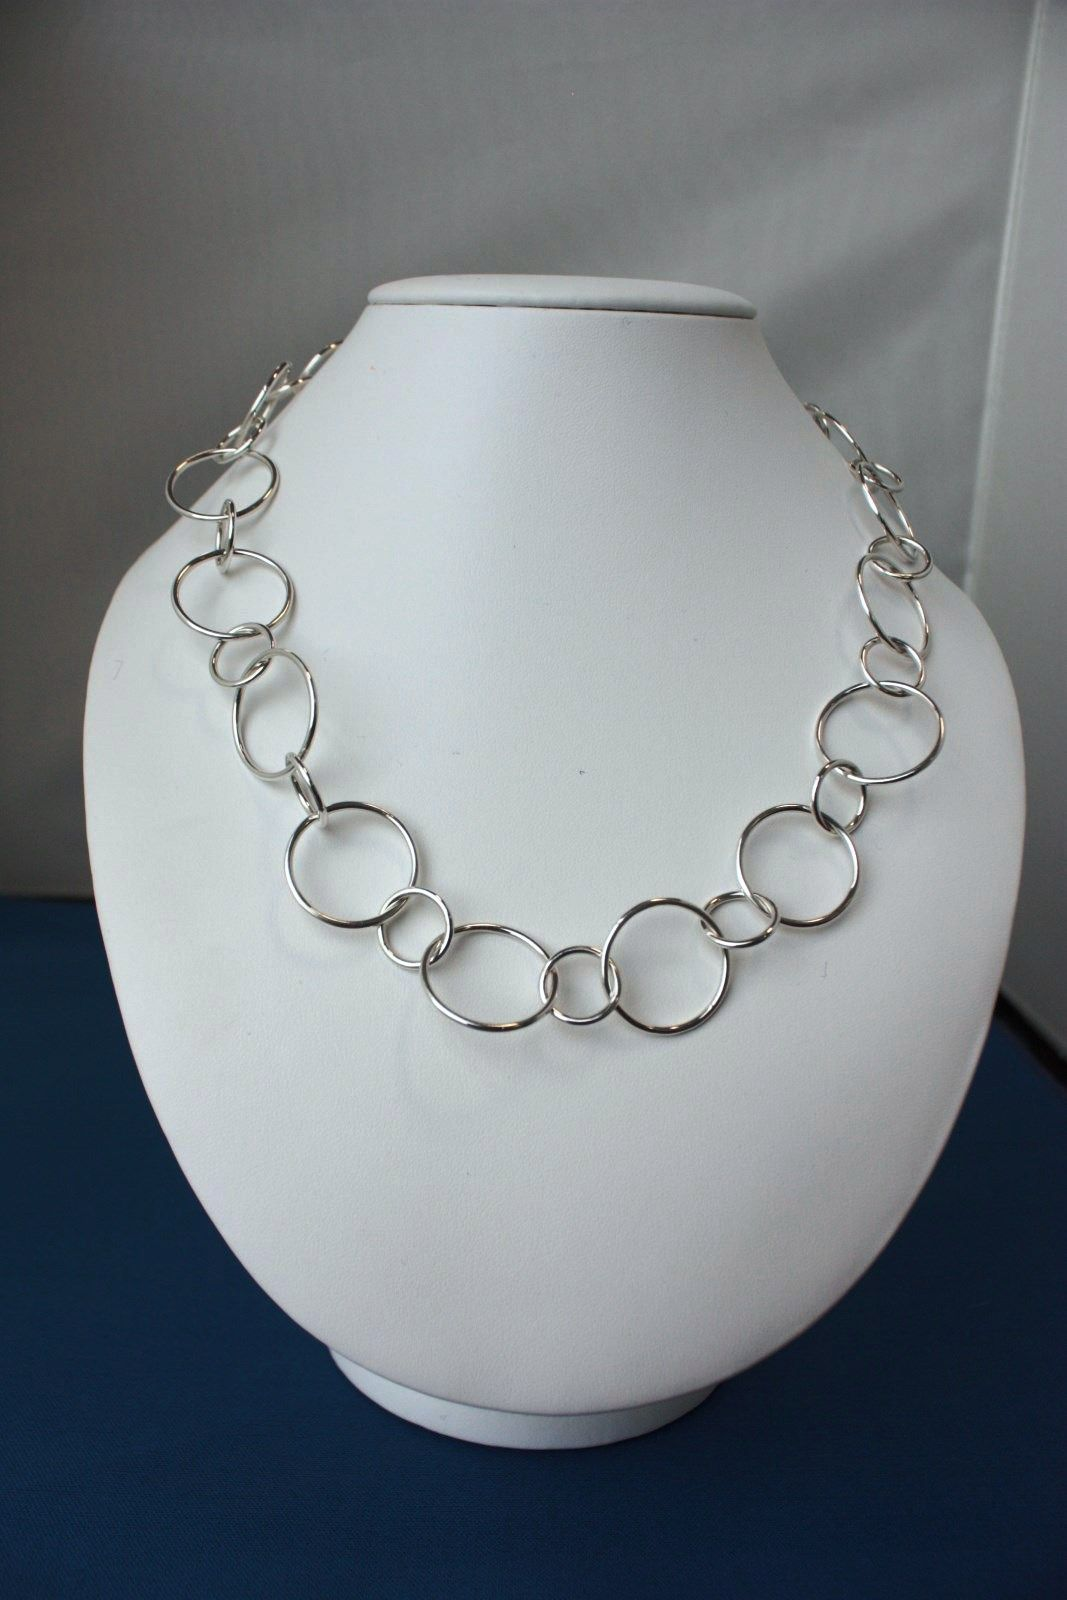 Classic immaculate chain by Vierka Bodisova - Level 2 jewellery class.  So elegant & Lovely! Photo by Wayne Jones